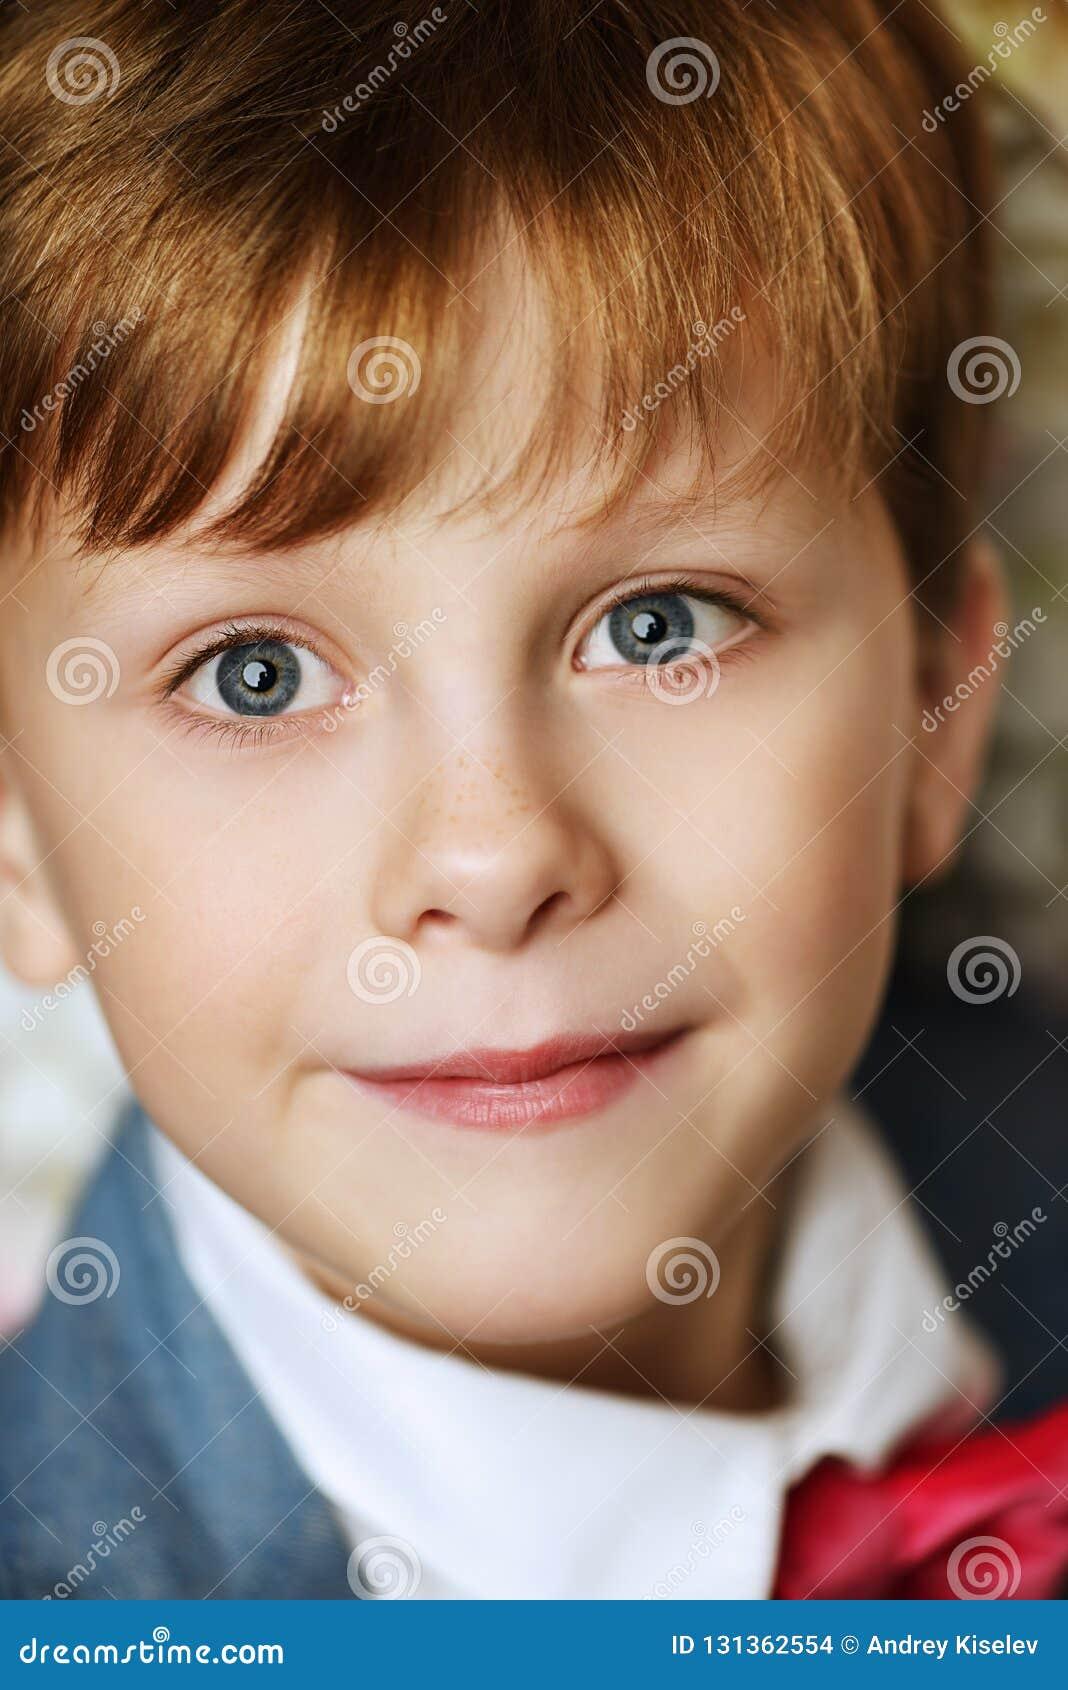 Boy close up